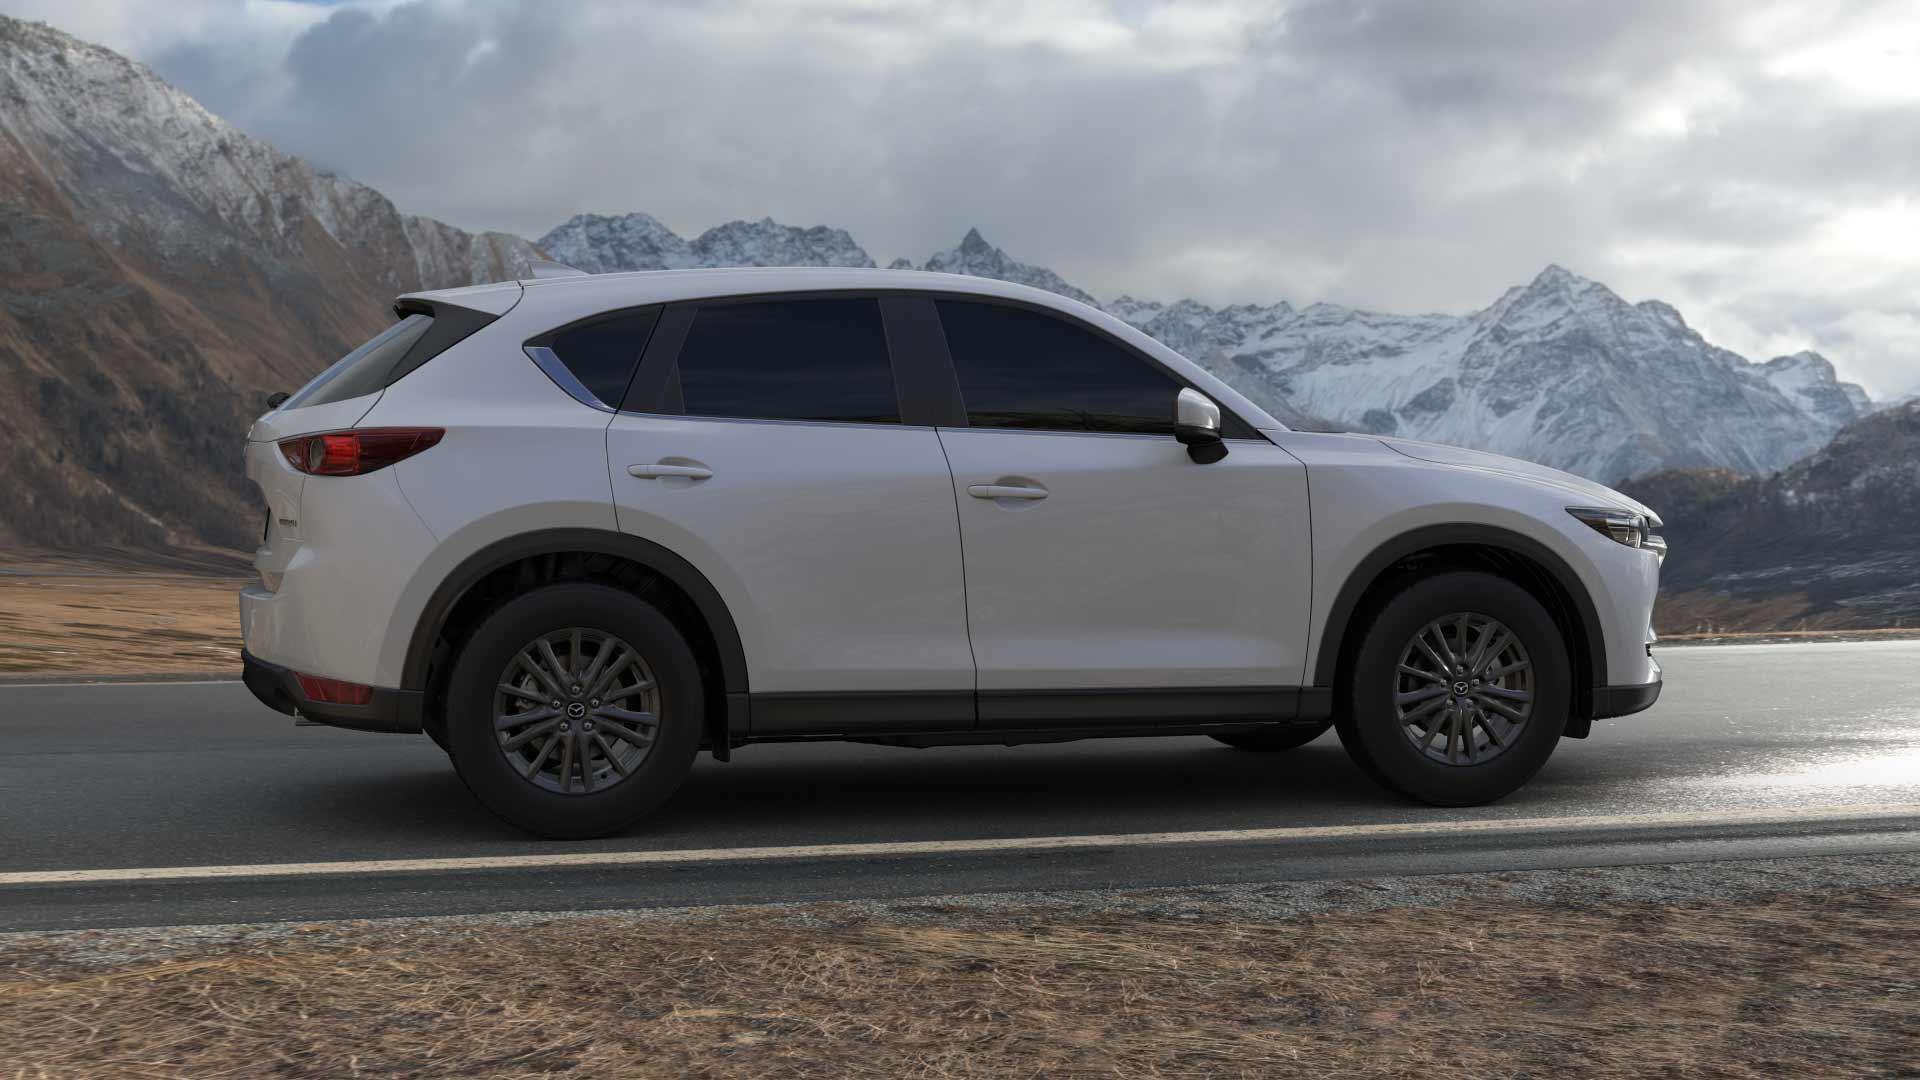 Kelebihan Mazda Cx 5 2021 Tangguh